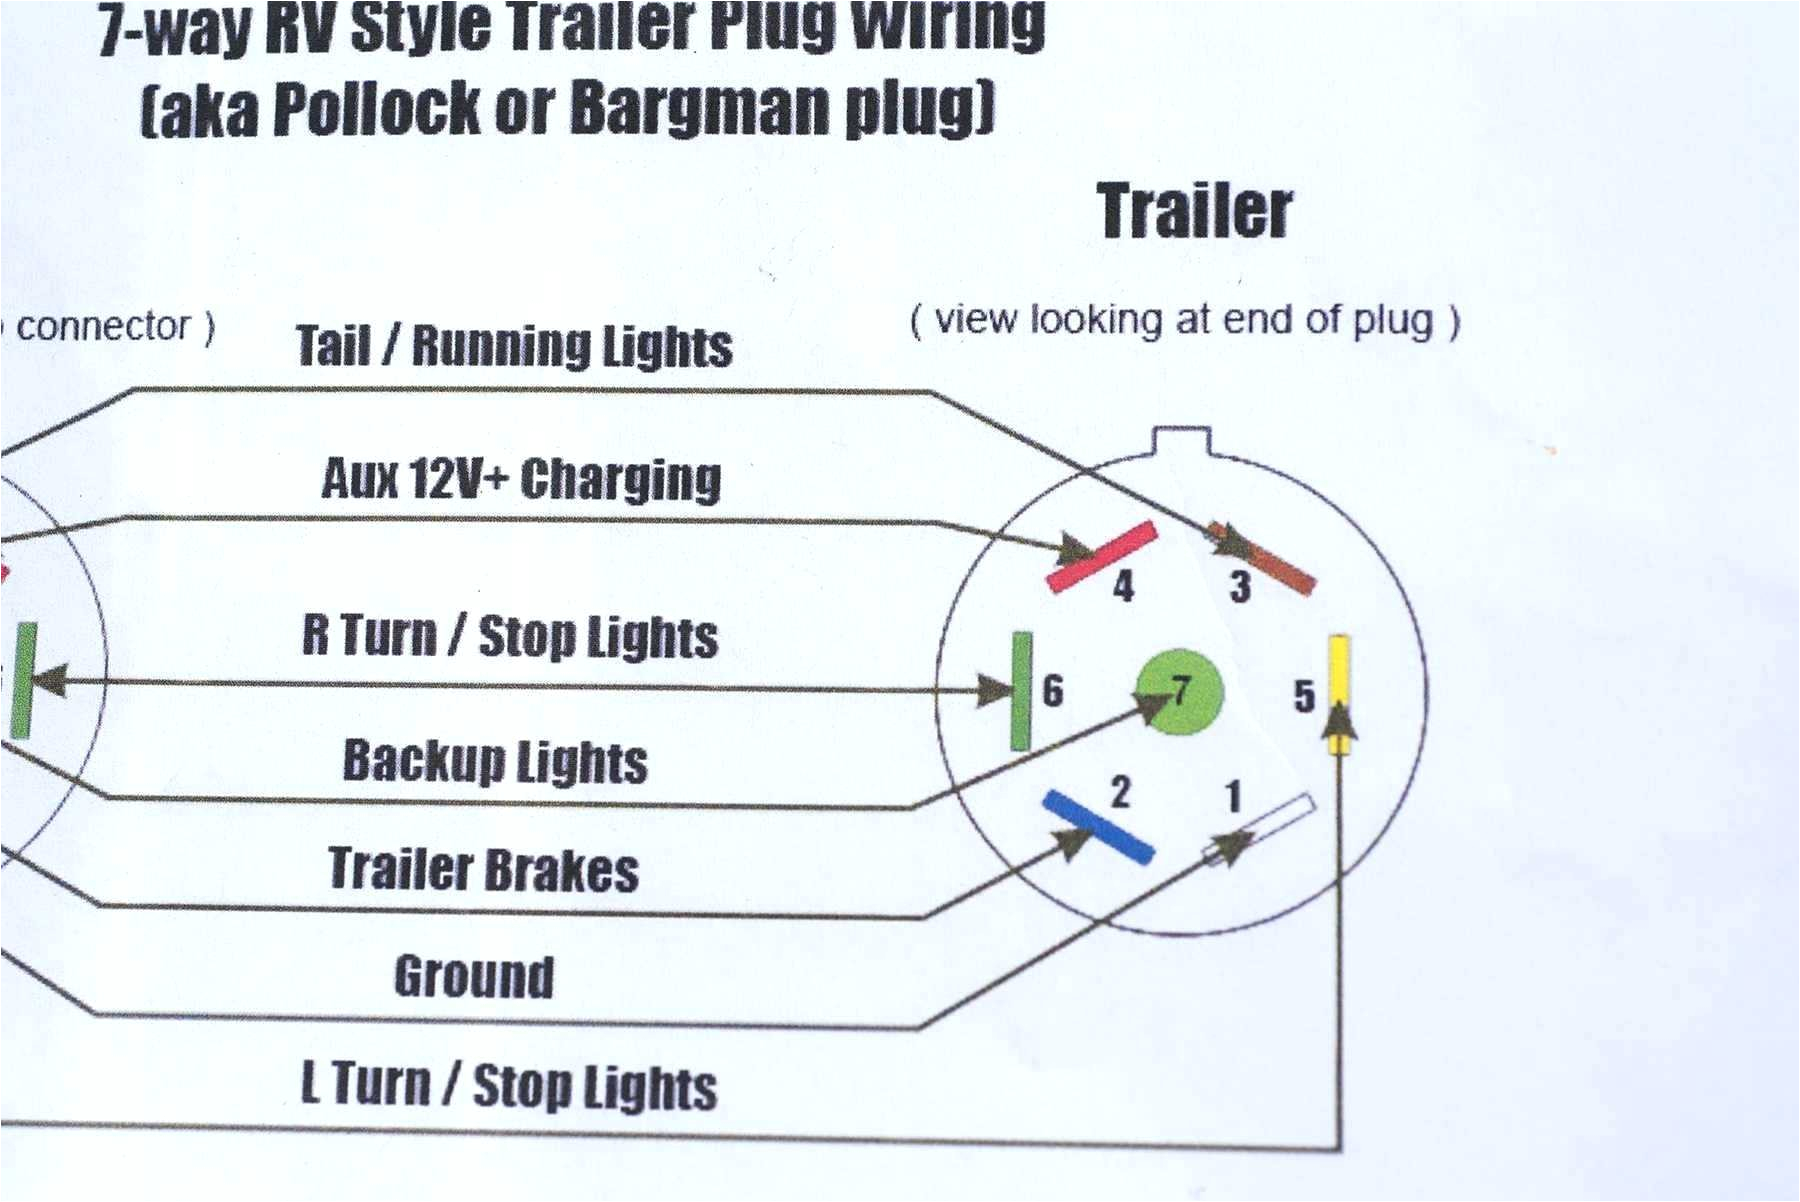 flat 4 wiring diagram gmc wiring diagram toolbox gmc trailer plug wiring diagram free picture